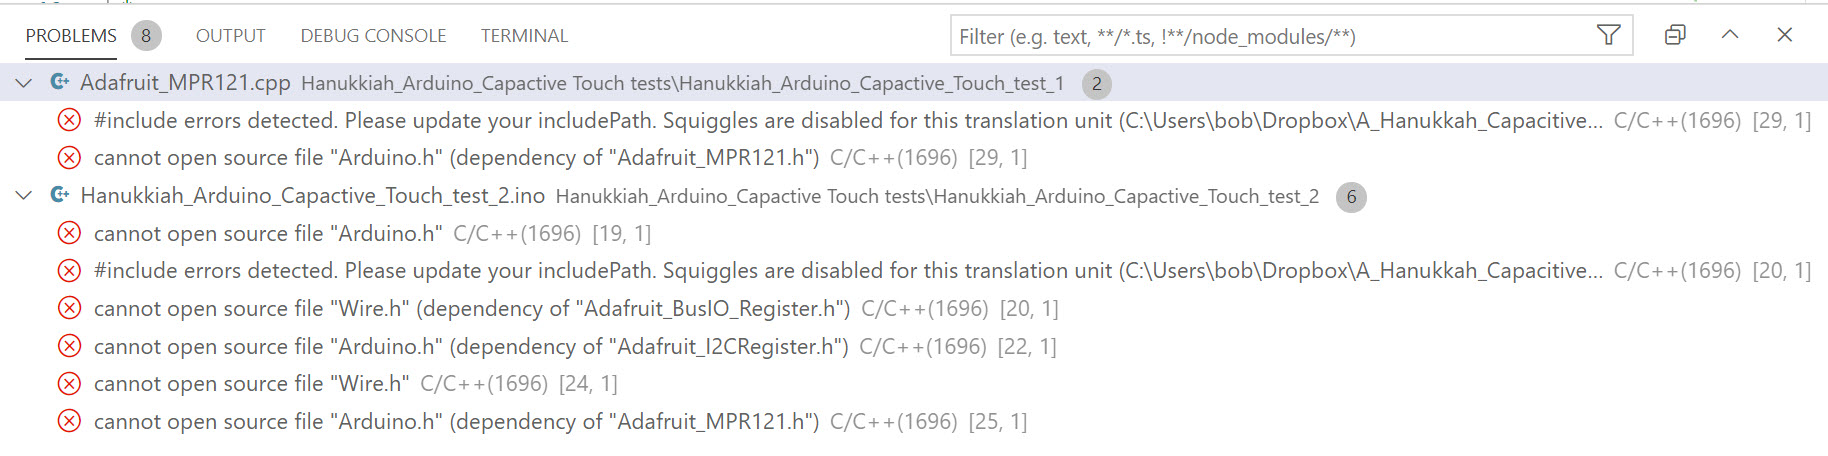 Hanukkiah_Arduino_Capactive_Touch_test_ERRORS